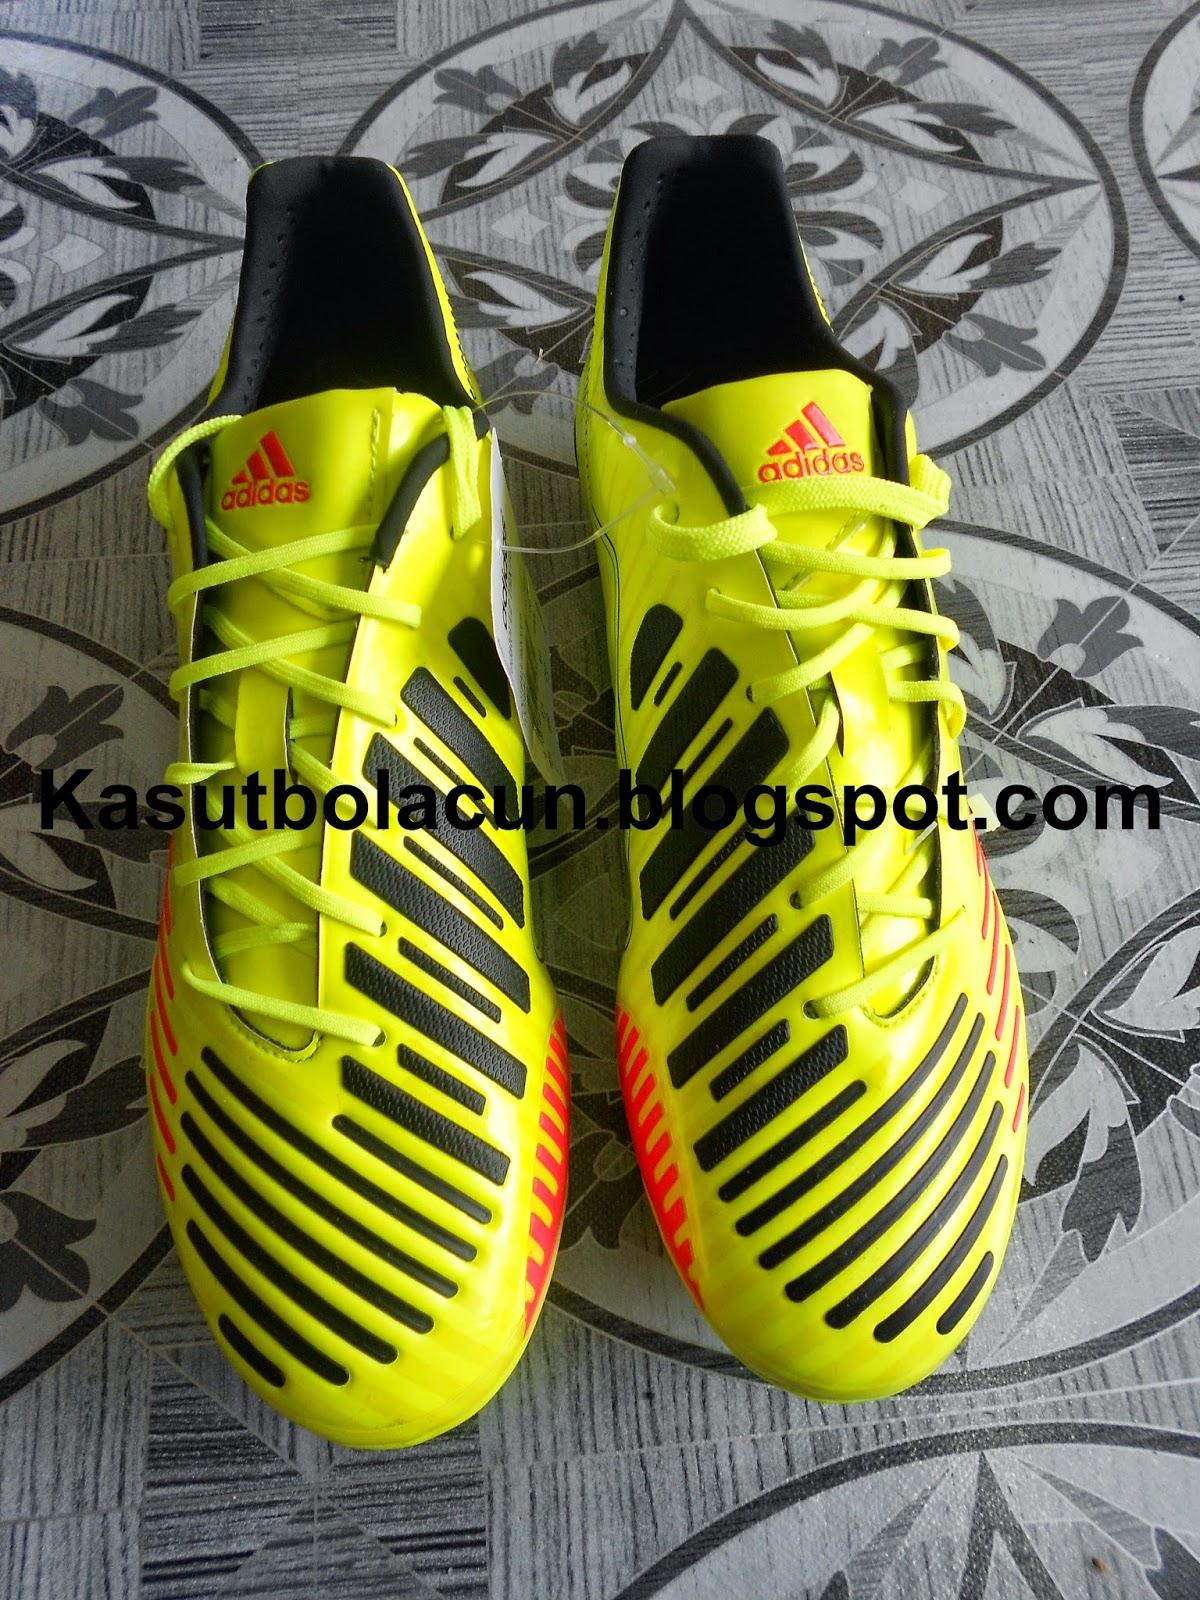 http://kasutbolacun.blogspot.com/2015/04/adidas-predator-lz-1-fg-sl-edition.html